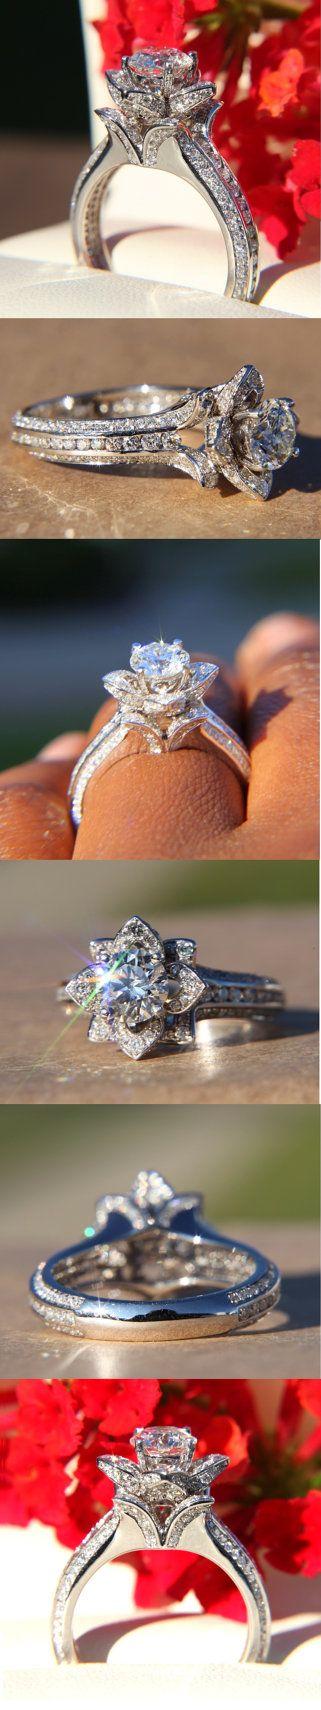 Rose Diamond Ring! LOVE